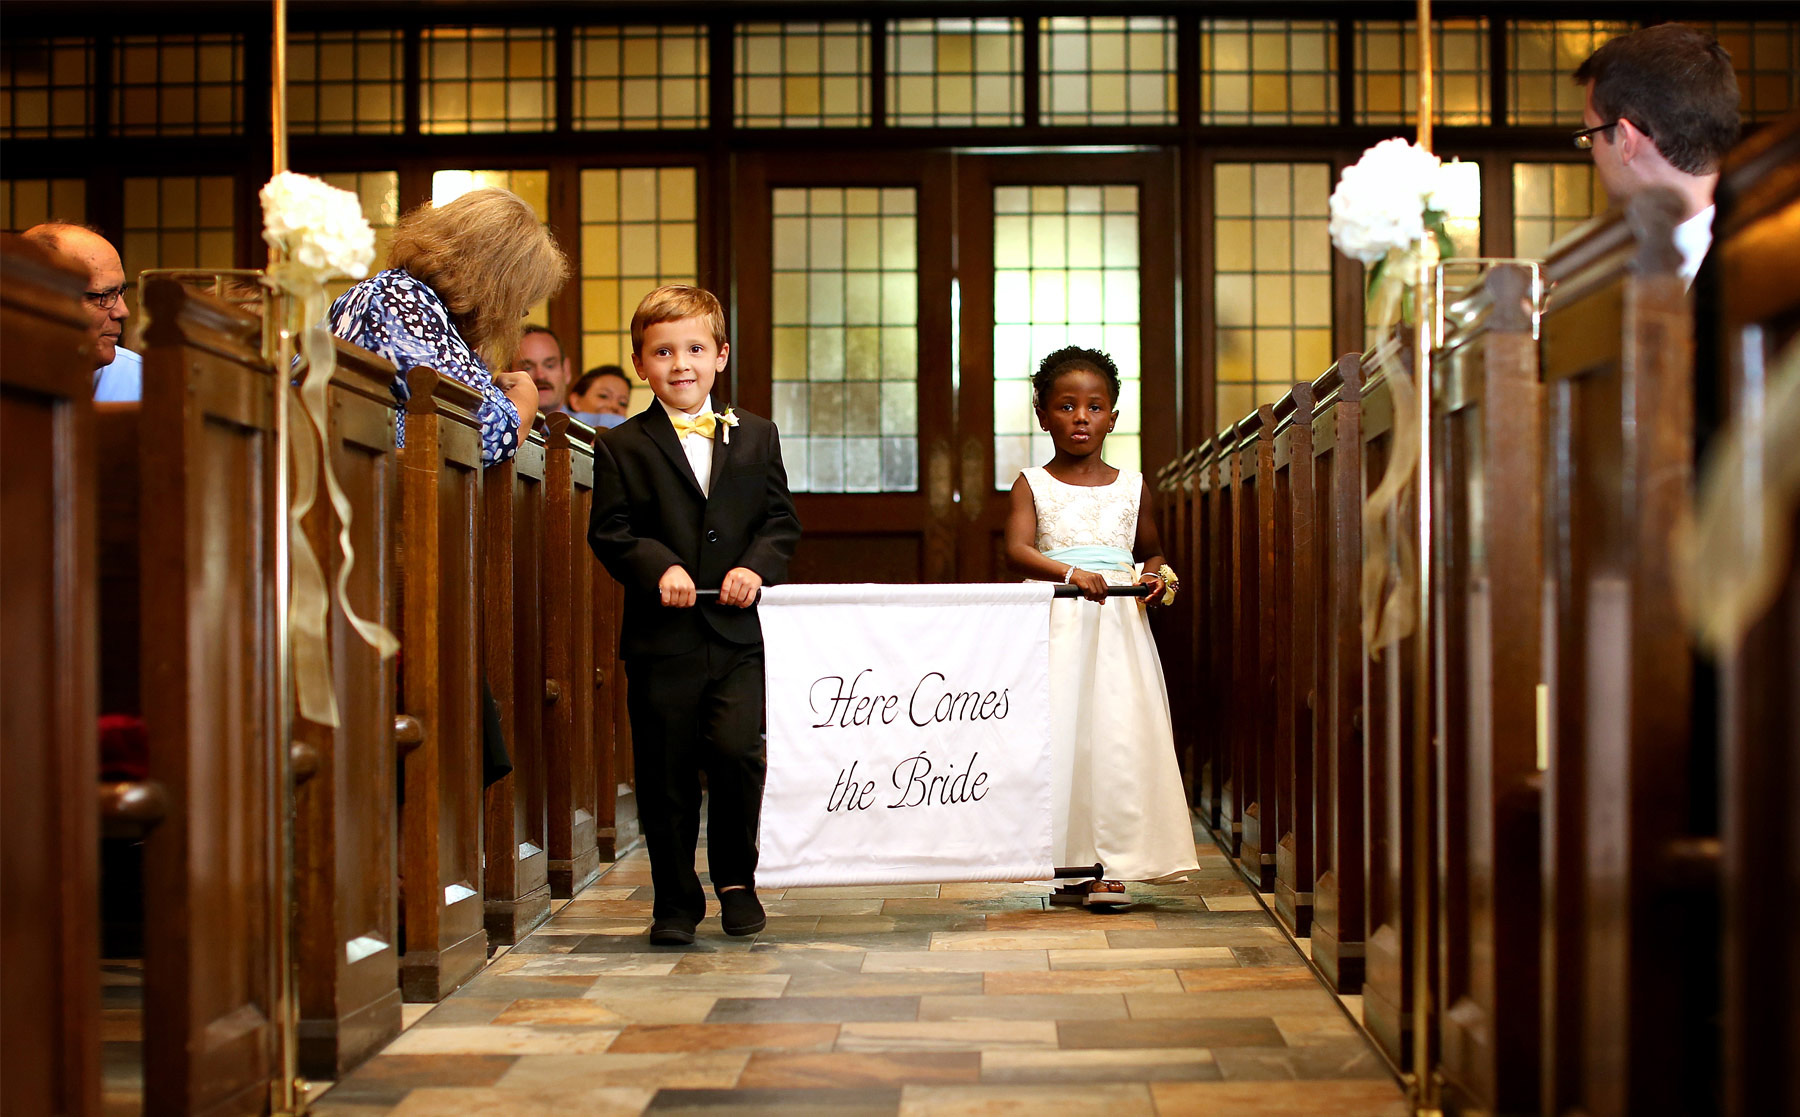 06-Minneapolis-Minnesota-Wedding-Photography-by-Vick-Photography-Edina-Bethlehem-Lutheran-Church-Ceremony-Grace-&-Nick.jpg